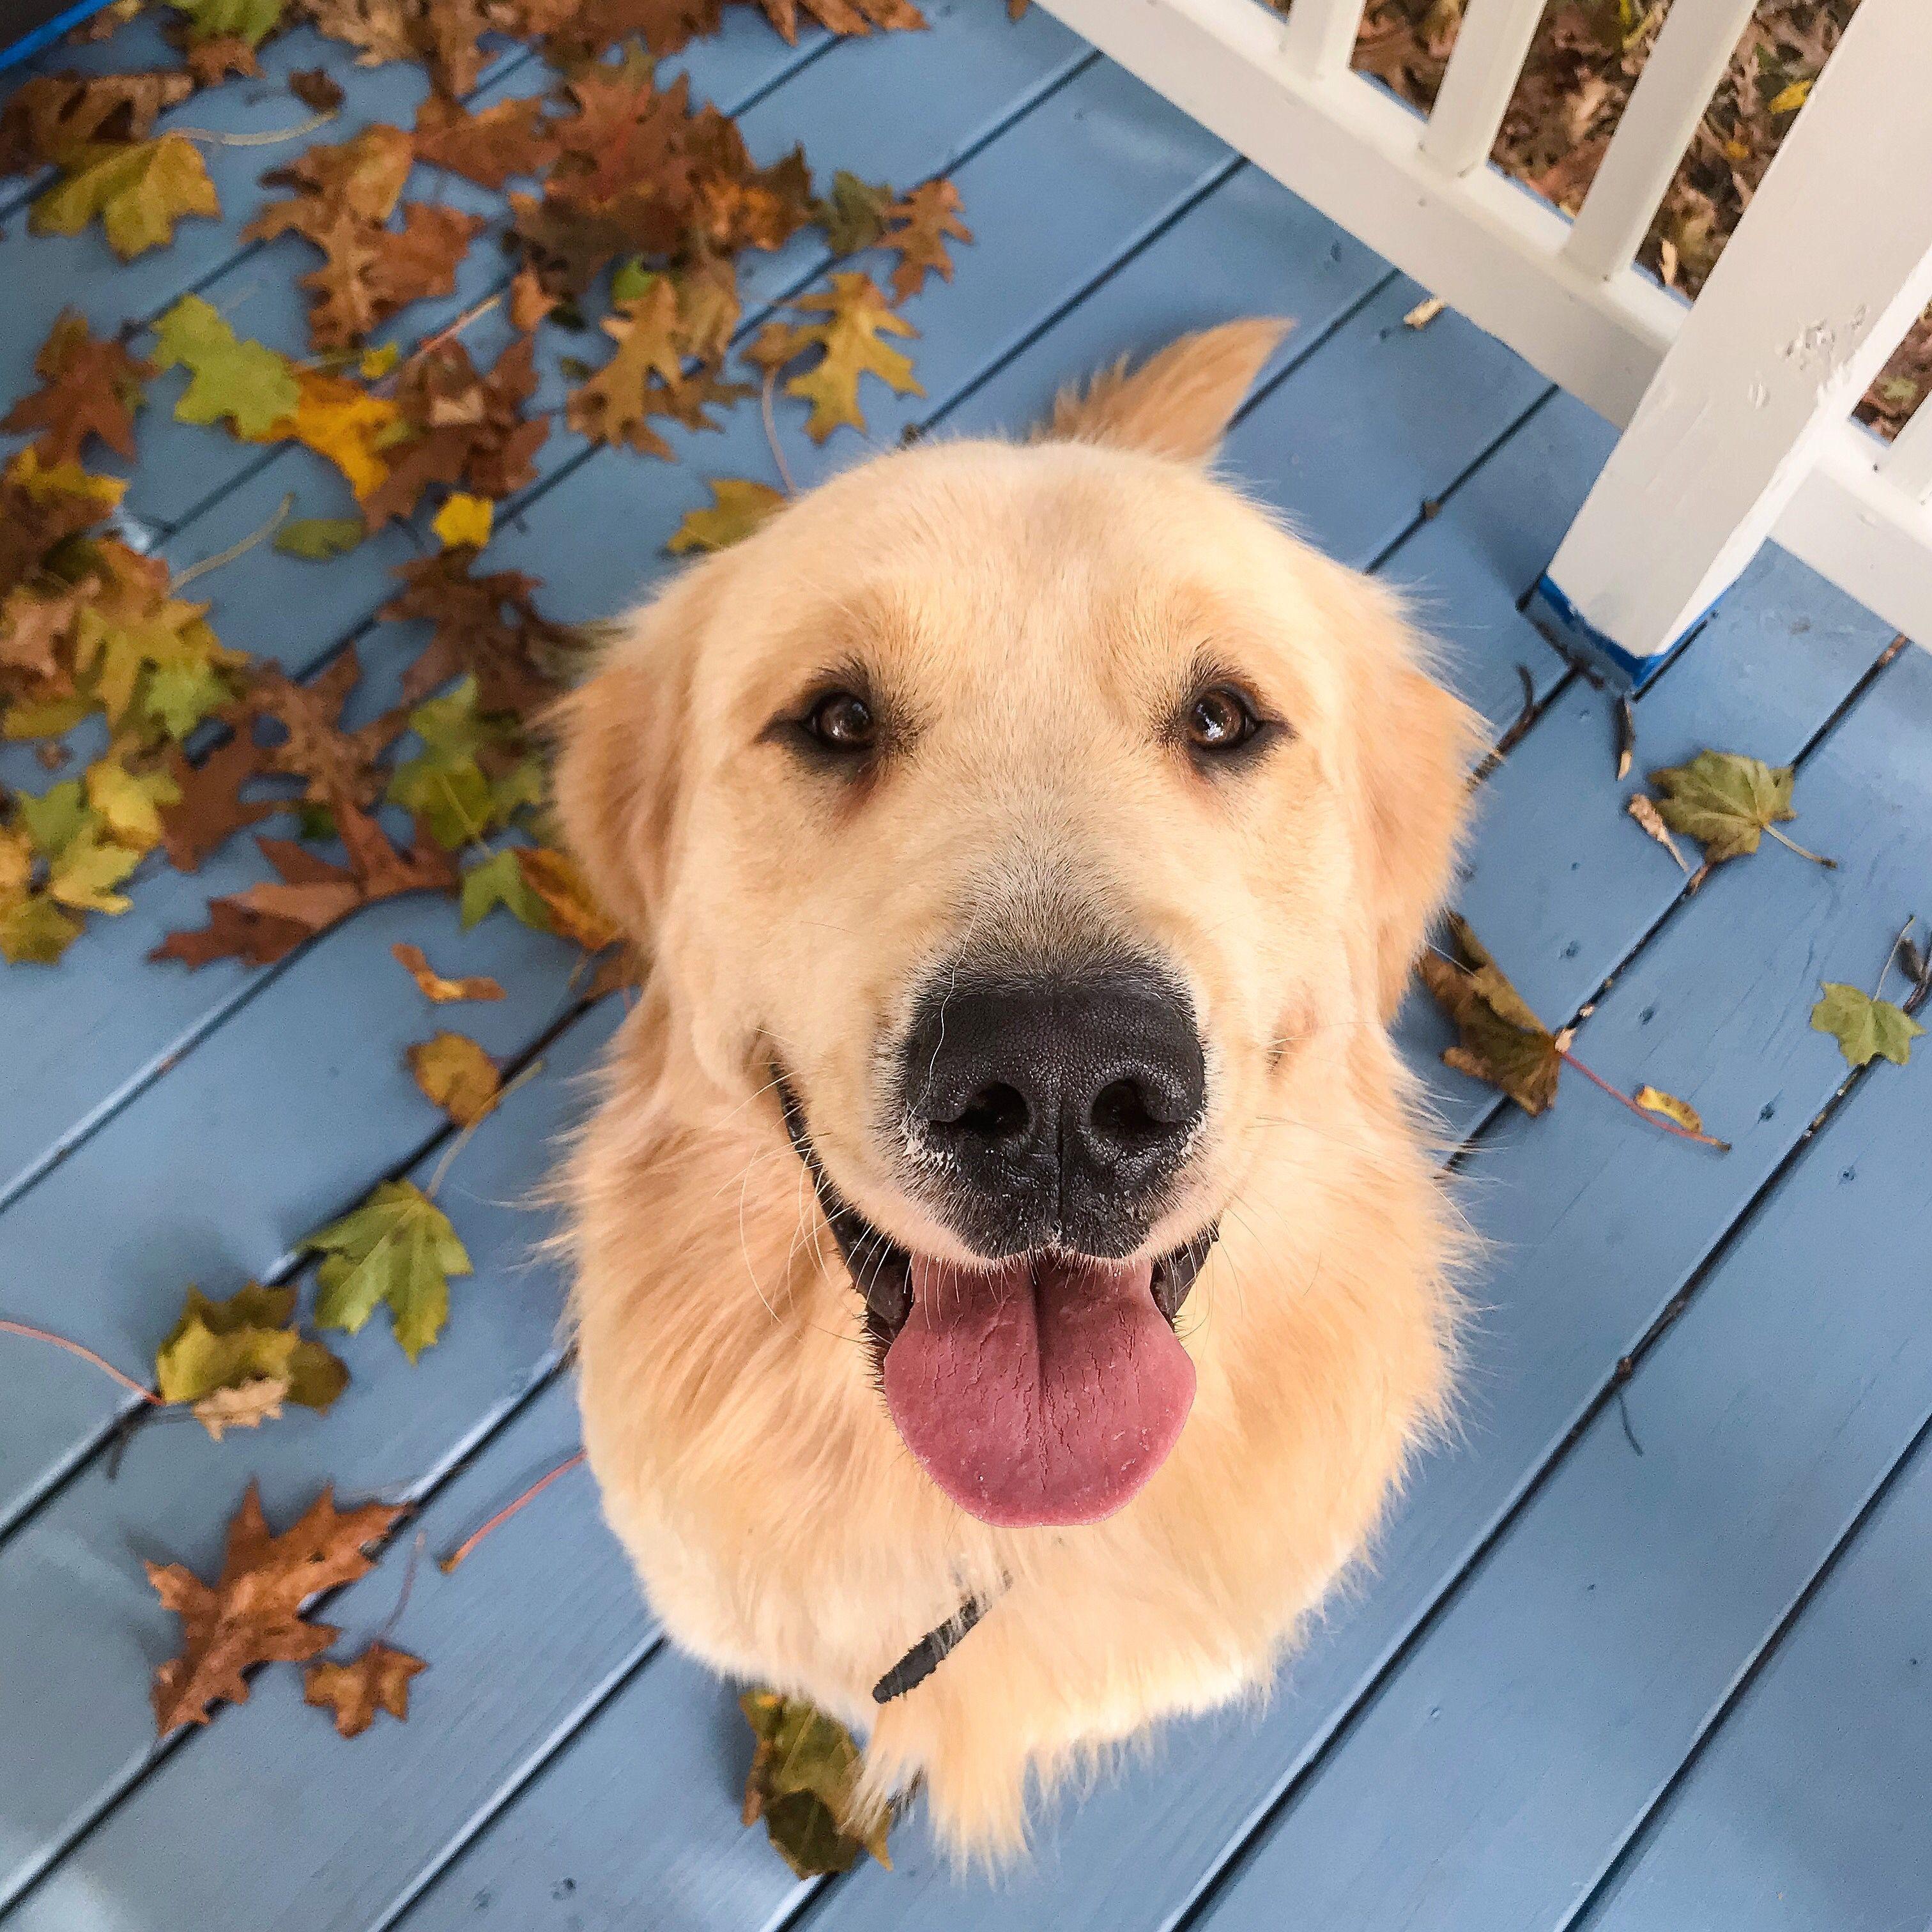 Golden Retriever Puppy From Maine Enjoying The Beautiful Fall